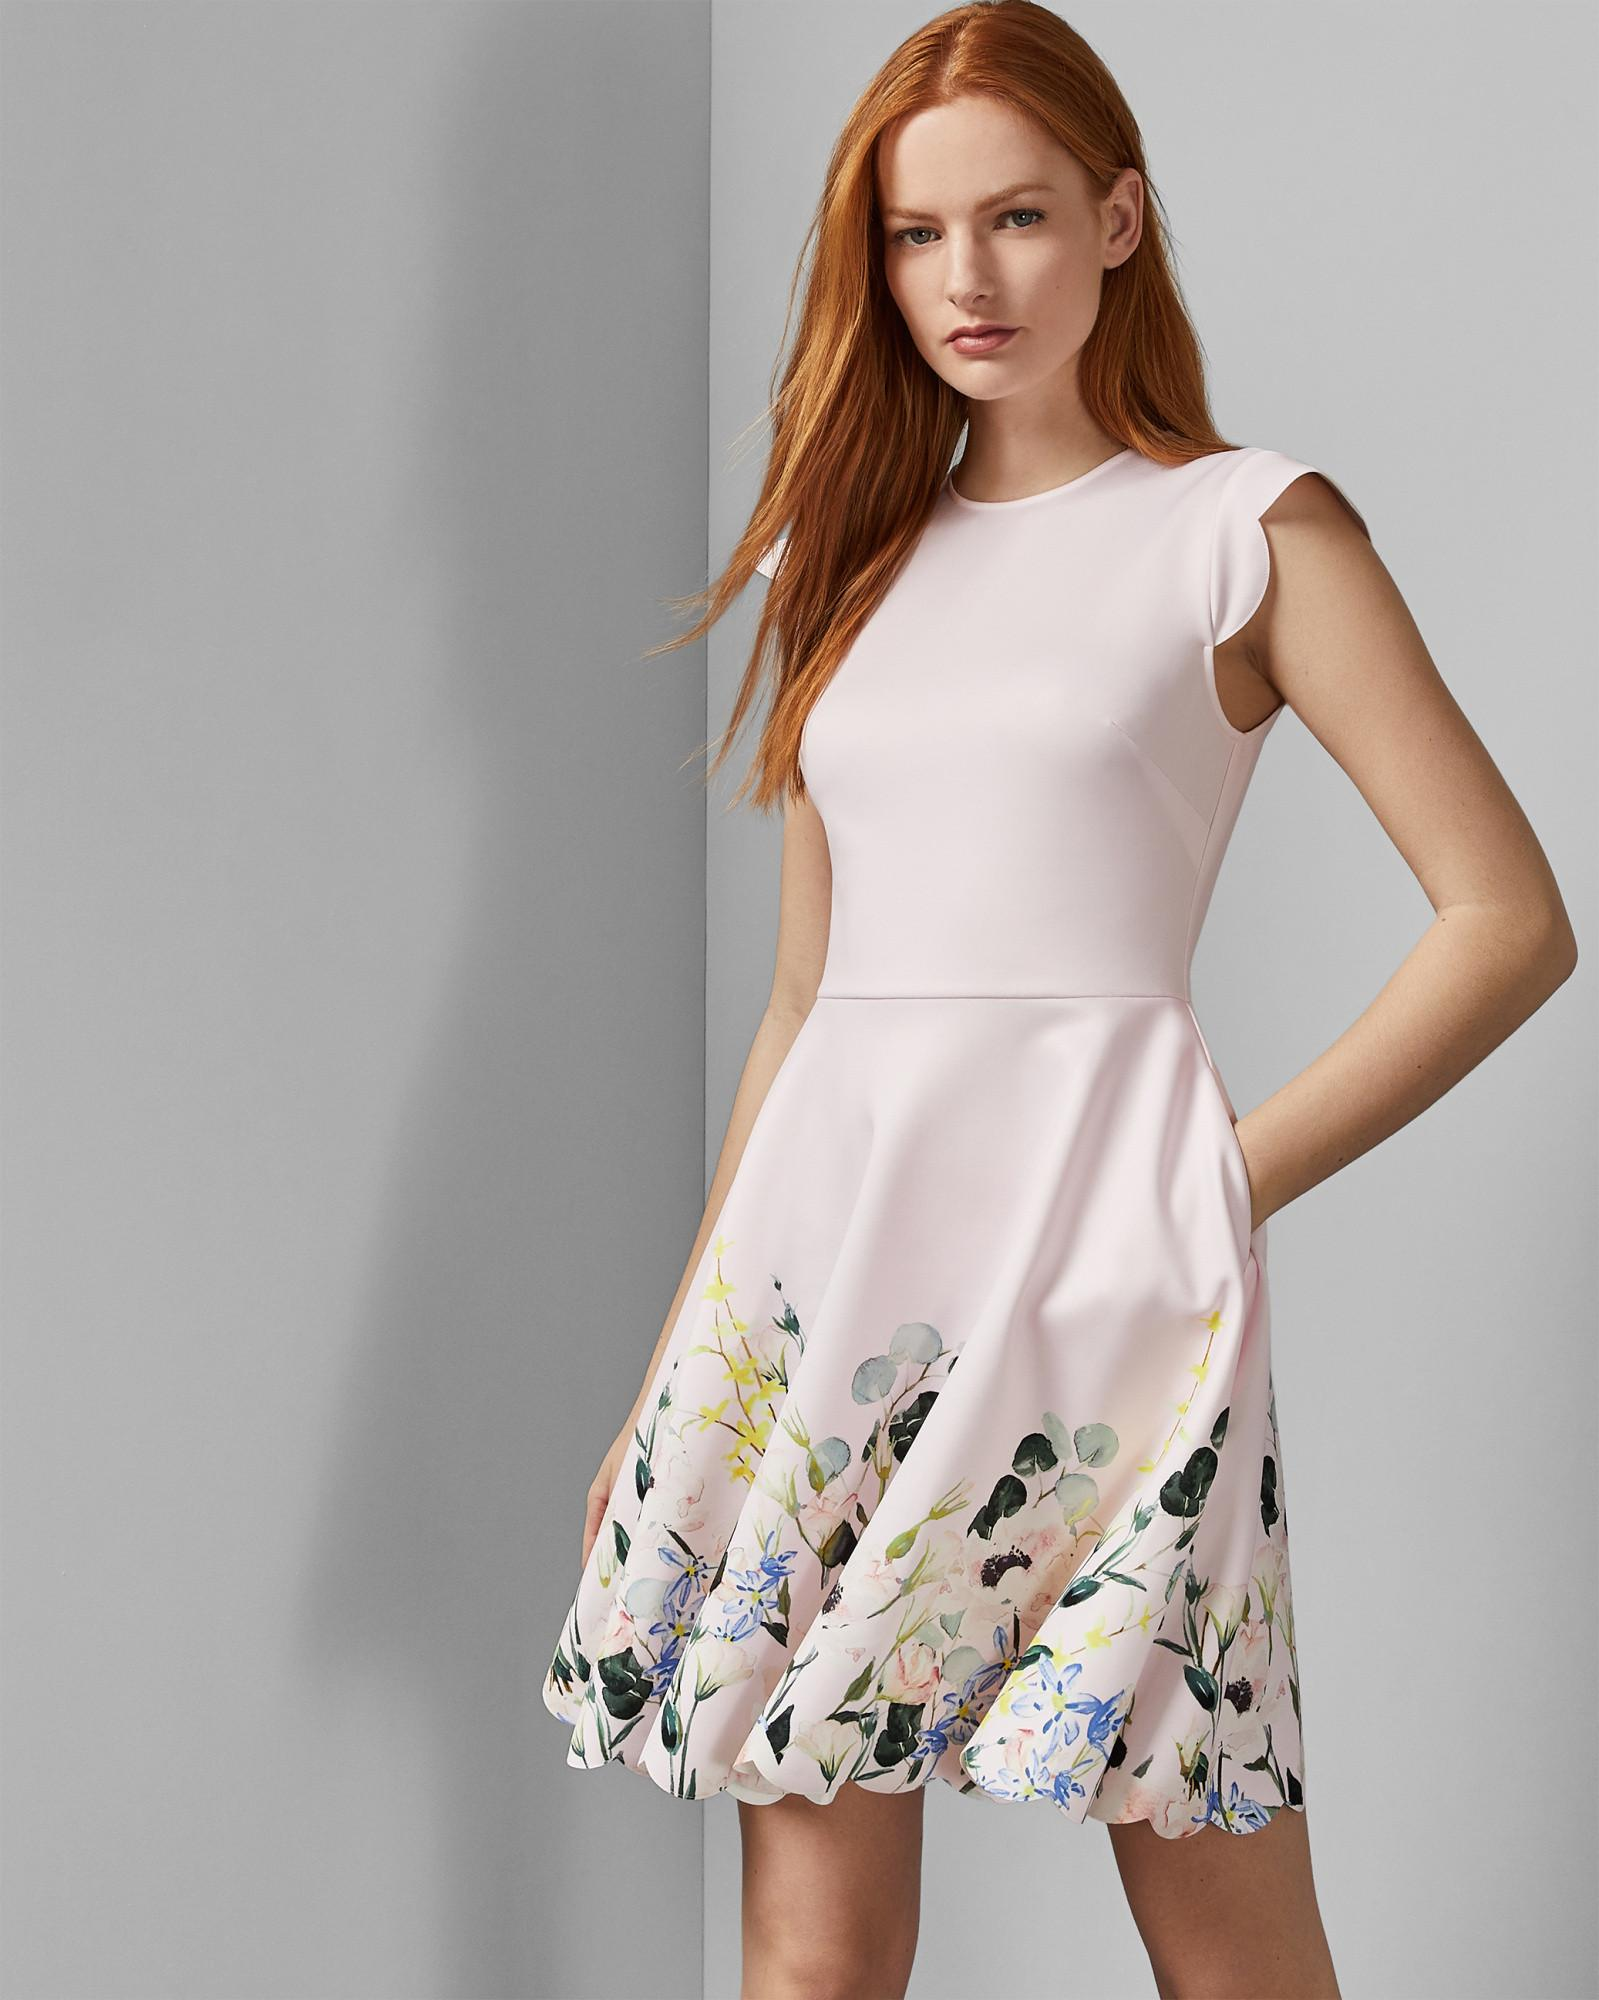 bbbecf2a38 Lyst - Ted Baker Bridgt Elegance-print Dress in Pink